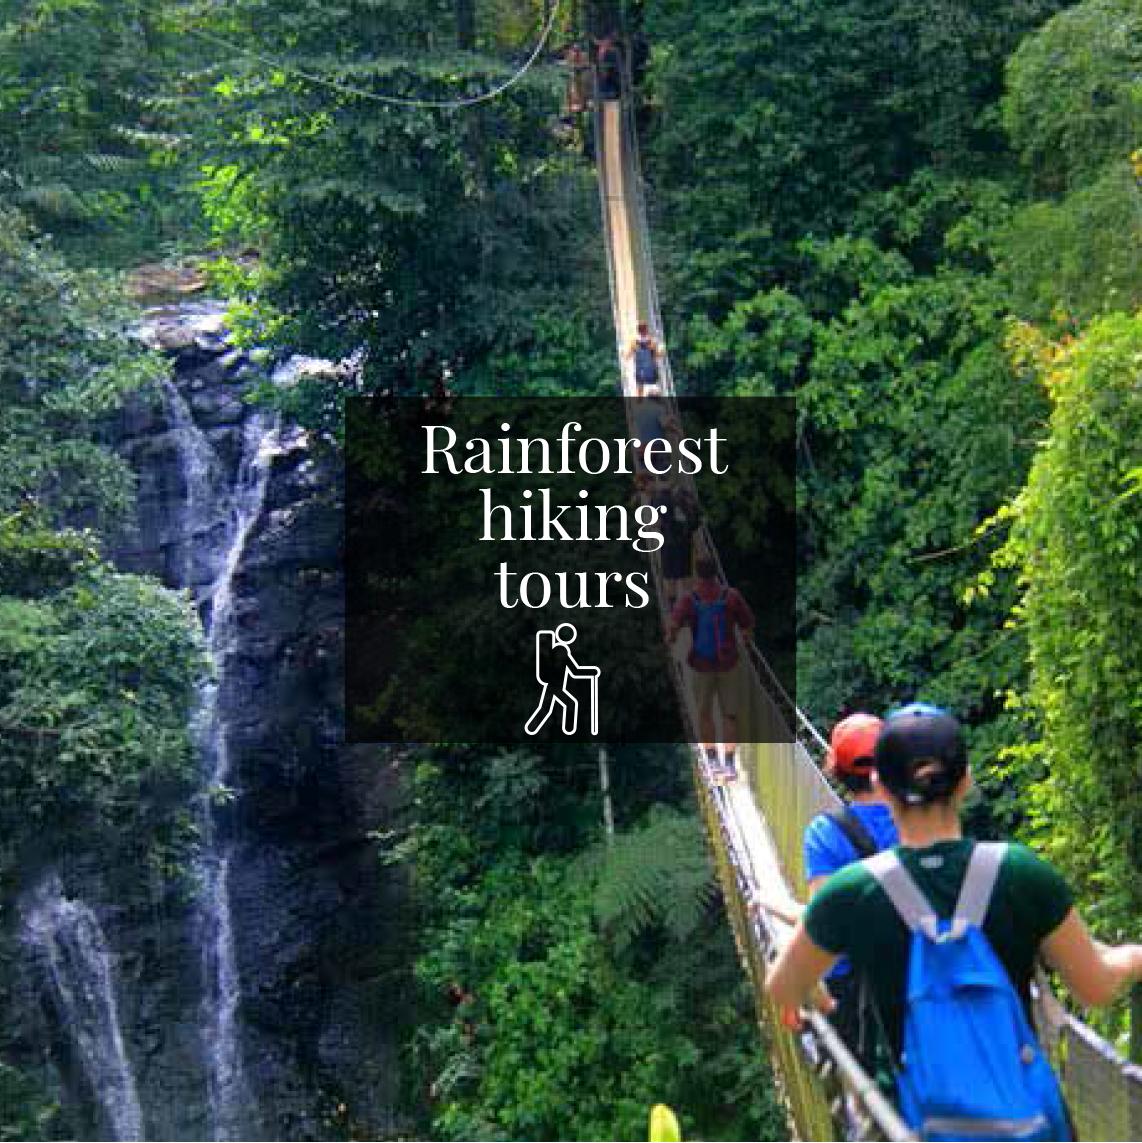 Rainforest hiking tours